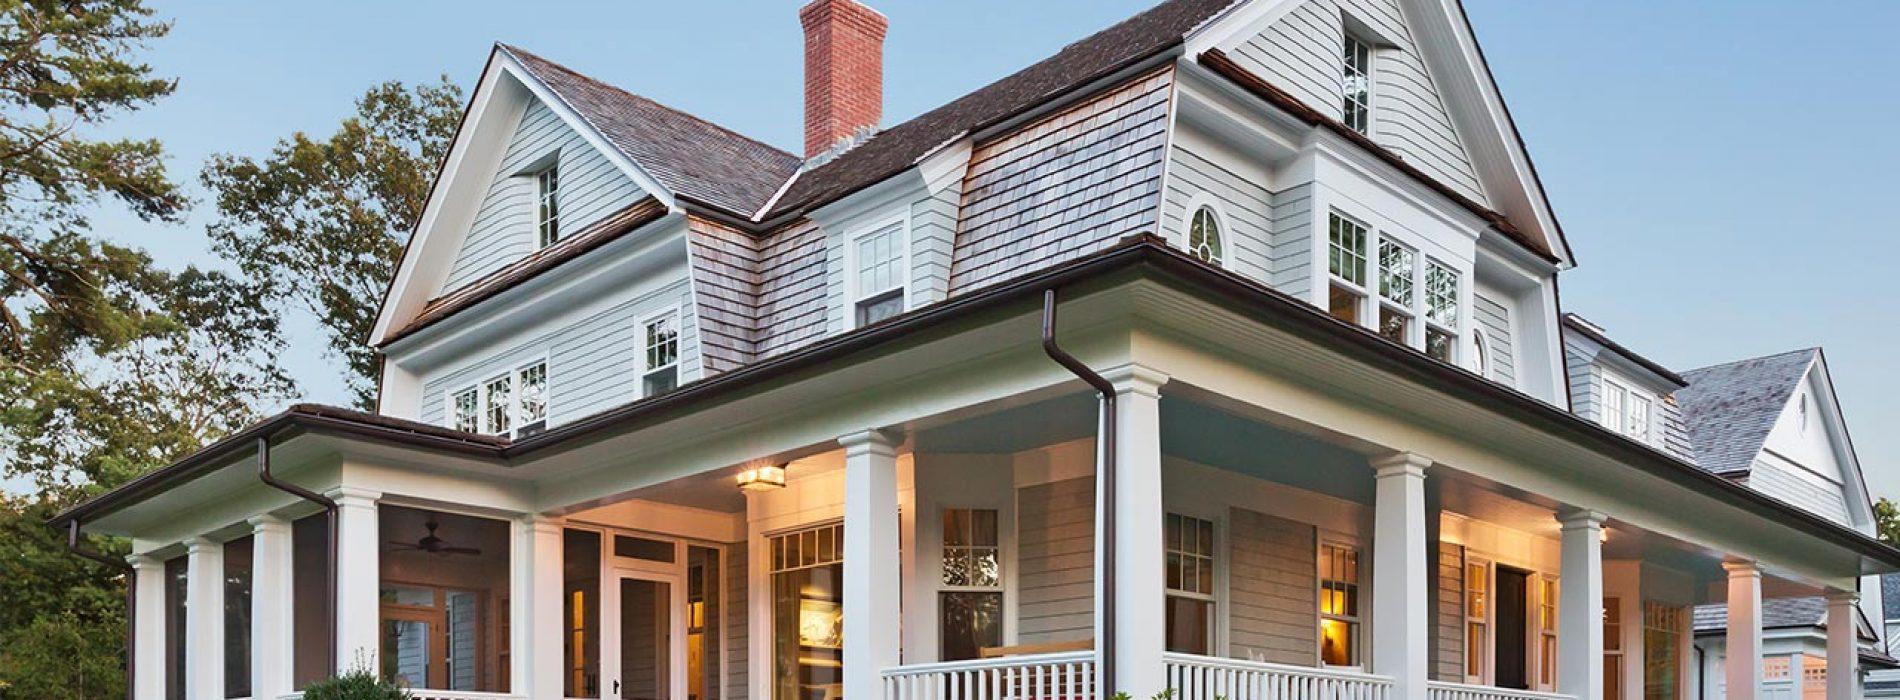 Don't Get Caught in a Fraudulent Home Improvement Scheme